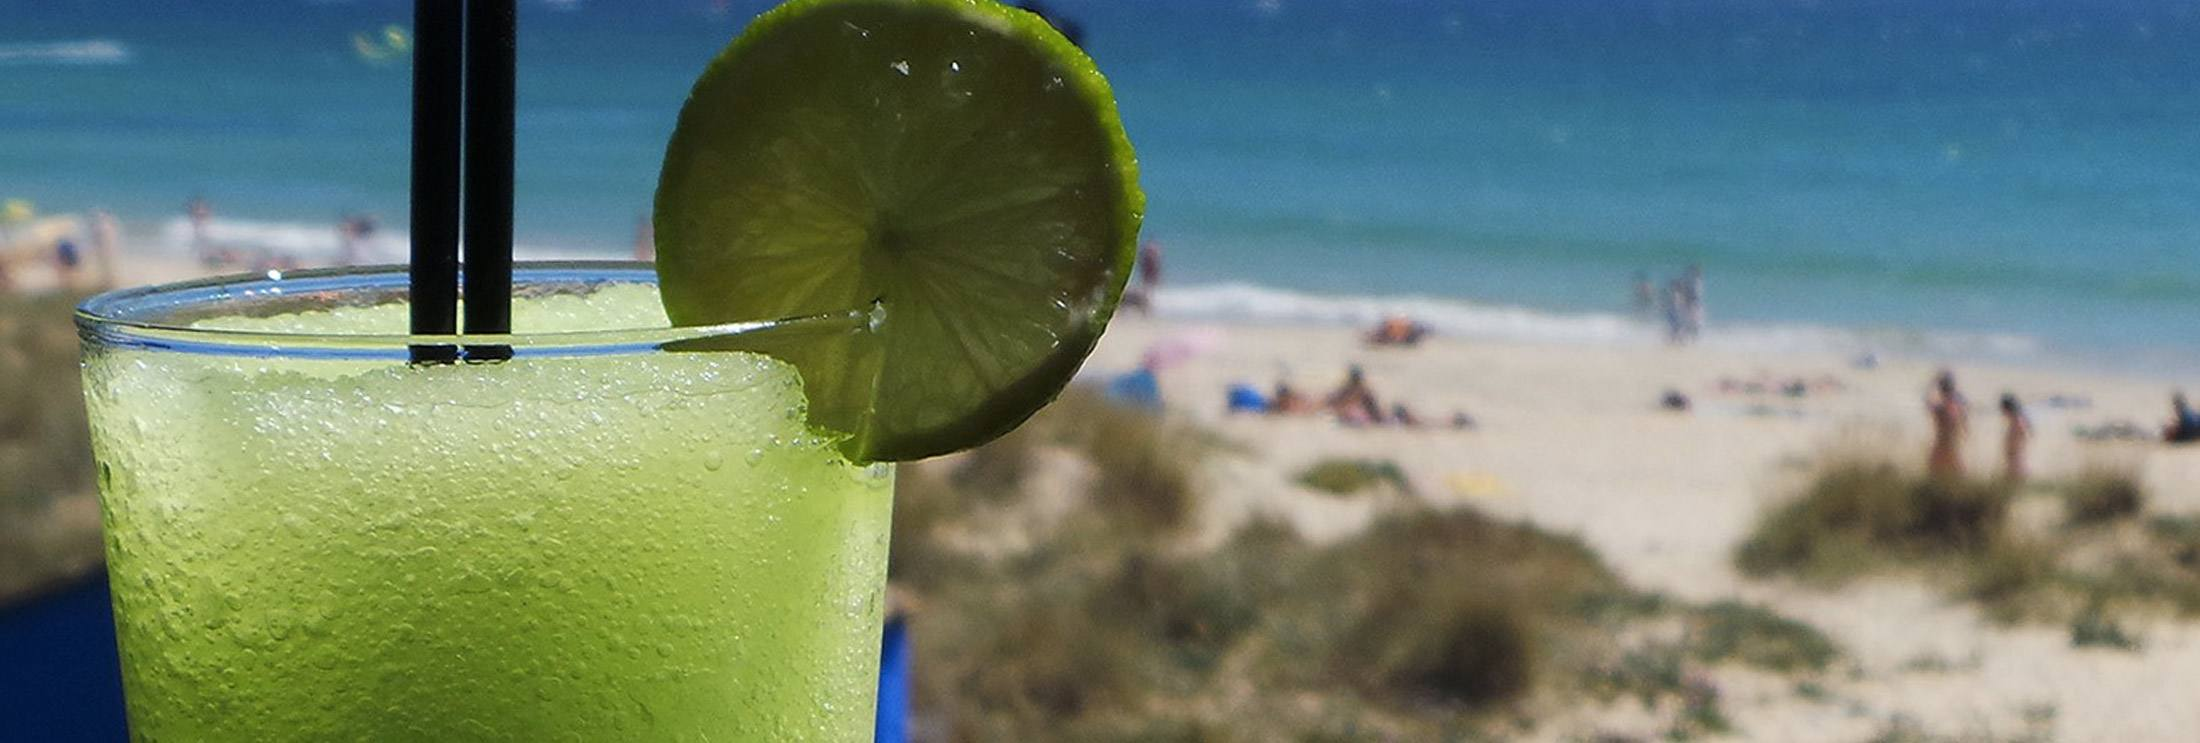 Beach-Lounge-Chiringuito-Beach-BarKiteSpot-Tarifa-los-lances-Balneario-freeride tarifa kitesurfing school